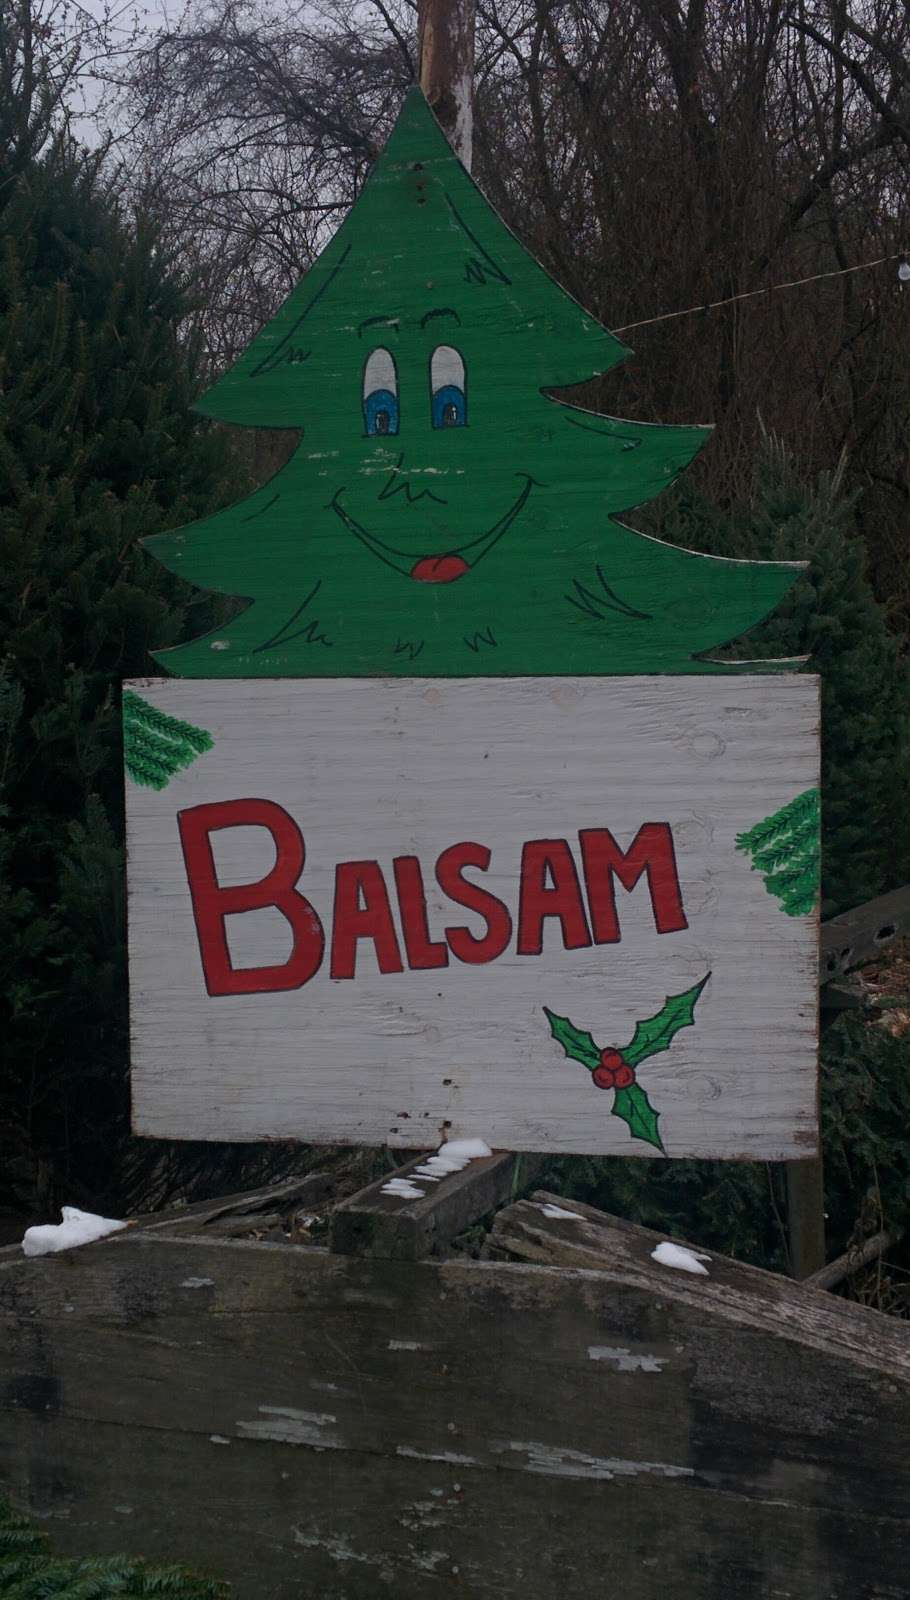 Bobs Tree Farm - home goods store  | Photo 4 of 4 | Address: 2-50 Ridge Rd, Wilmette, IL 60091, USA